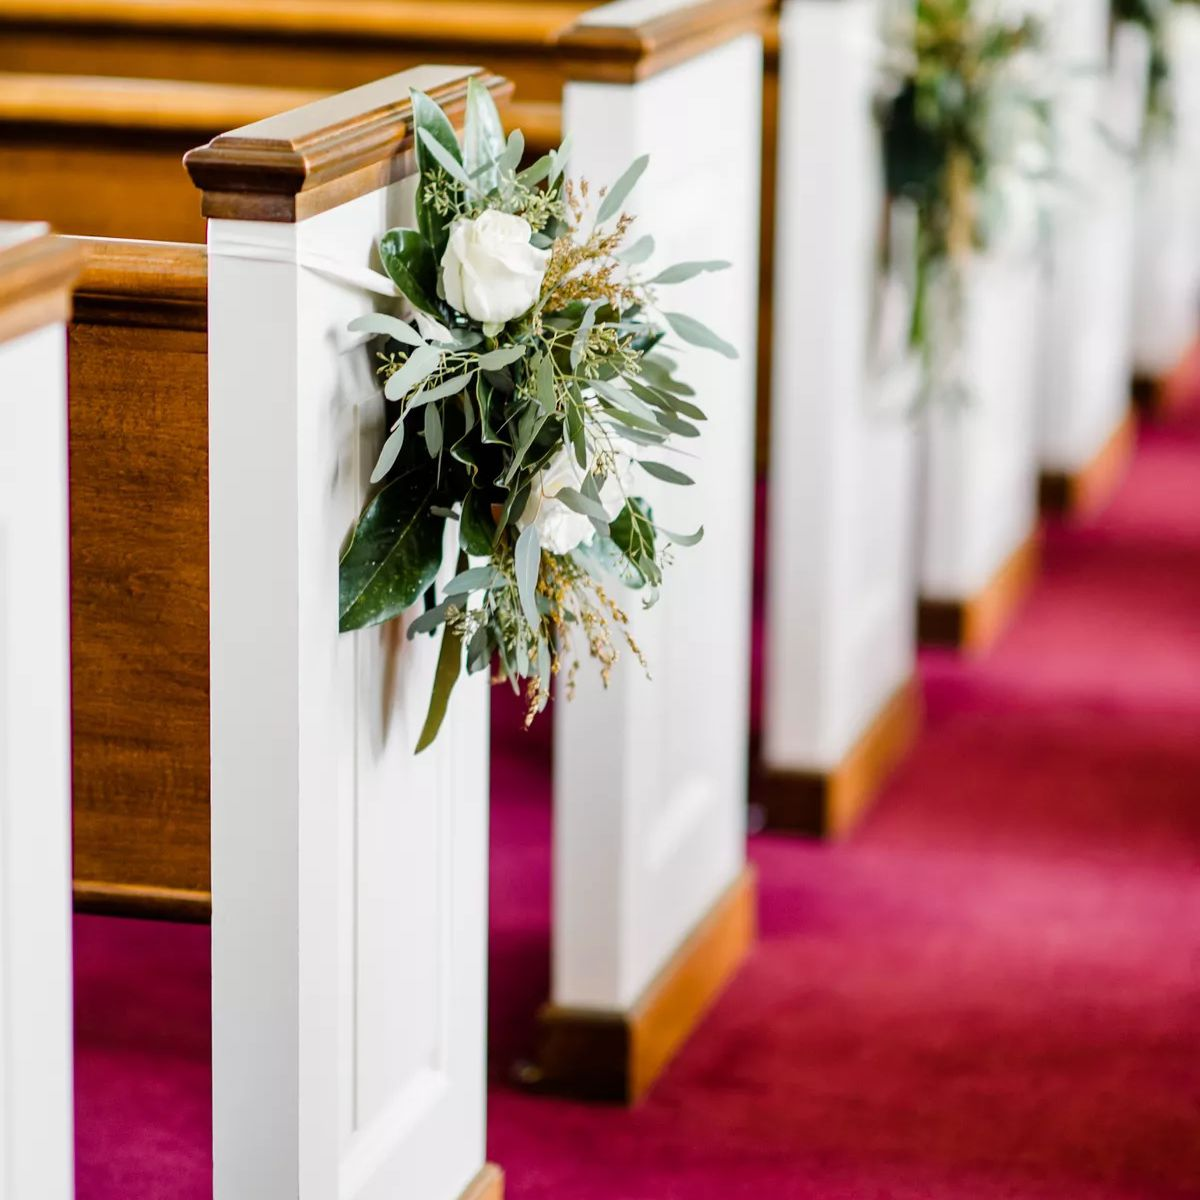 church pews with greenery